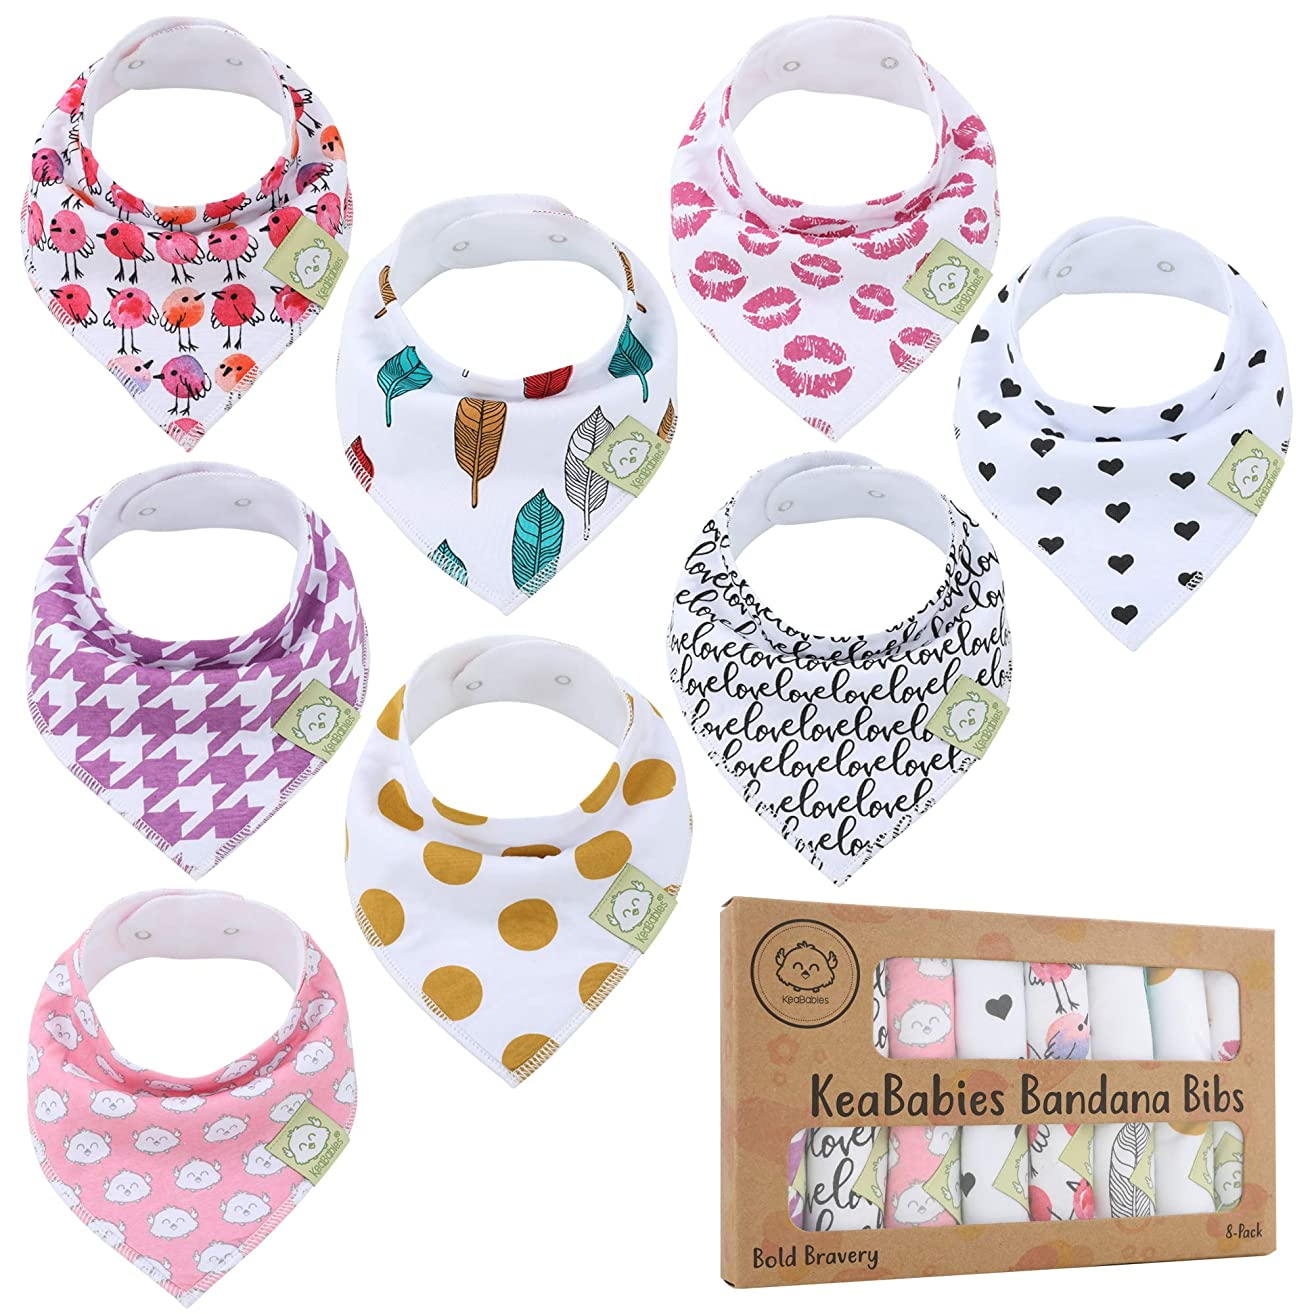 Baby Bandana Drool Bibs for Girls - Super Absorbent Organic Cotton Bandana Bibs - Baby Drool Bib - Teething Bibs - Handkerchief Bibs for Infant, Toddler - 8-Pack Bib Set - Bib Girl (Bold Bravery)